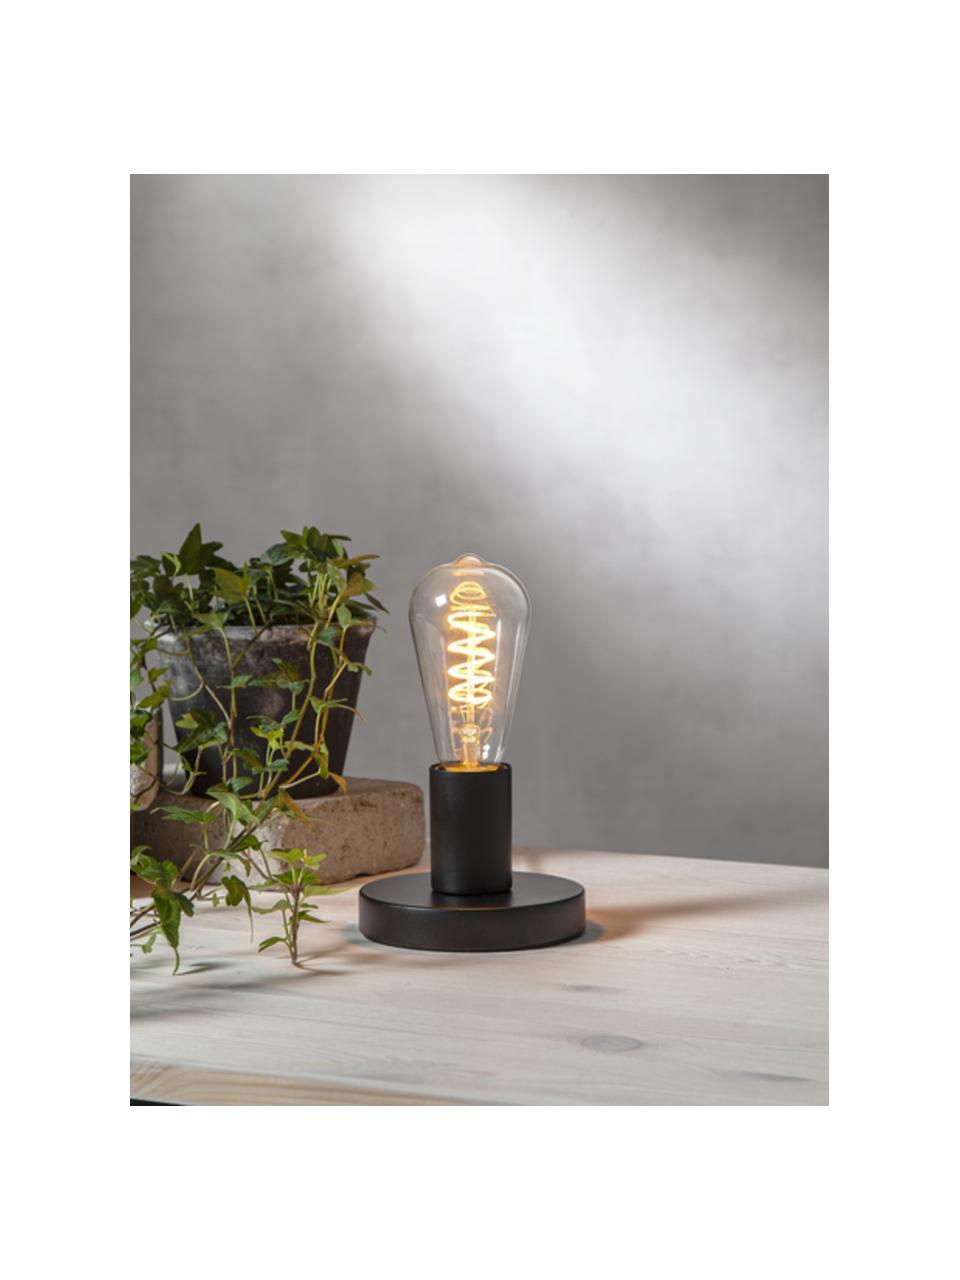 Lampadina E27, 4W, dimmerabile, bianco caldo 1 pz, Lampadina: vetro, Trasparente, Ø 6 x Alt. 14 cm